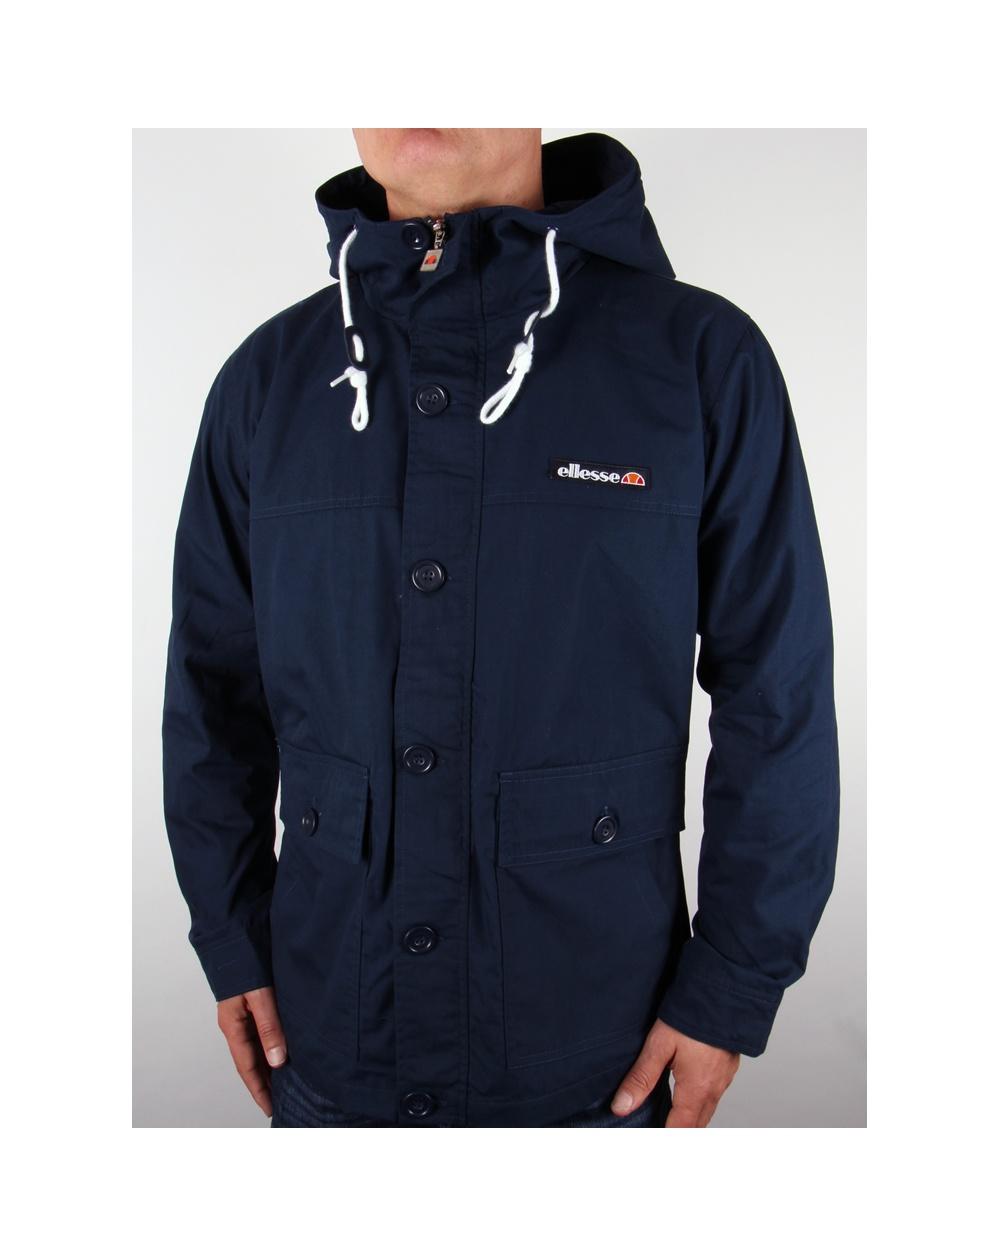 ellesse rallidae 2 jacket navy heritage rallidae coat mens. Black Bedroom Furniture Sets. Home Design Ideas